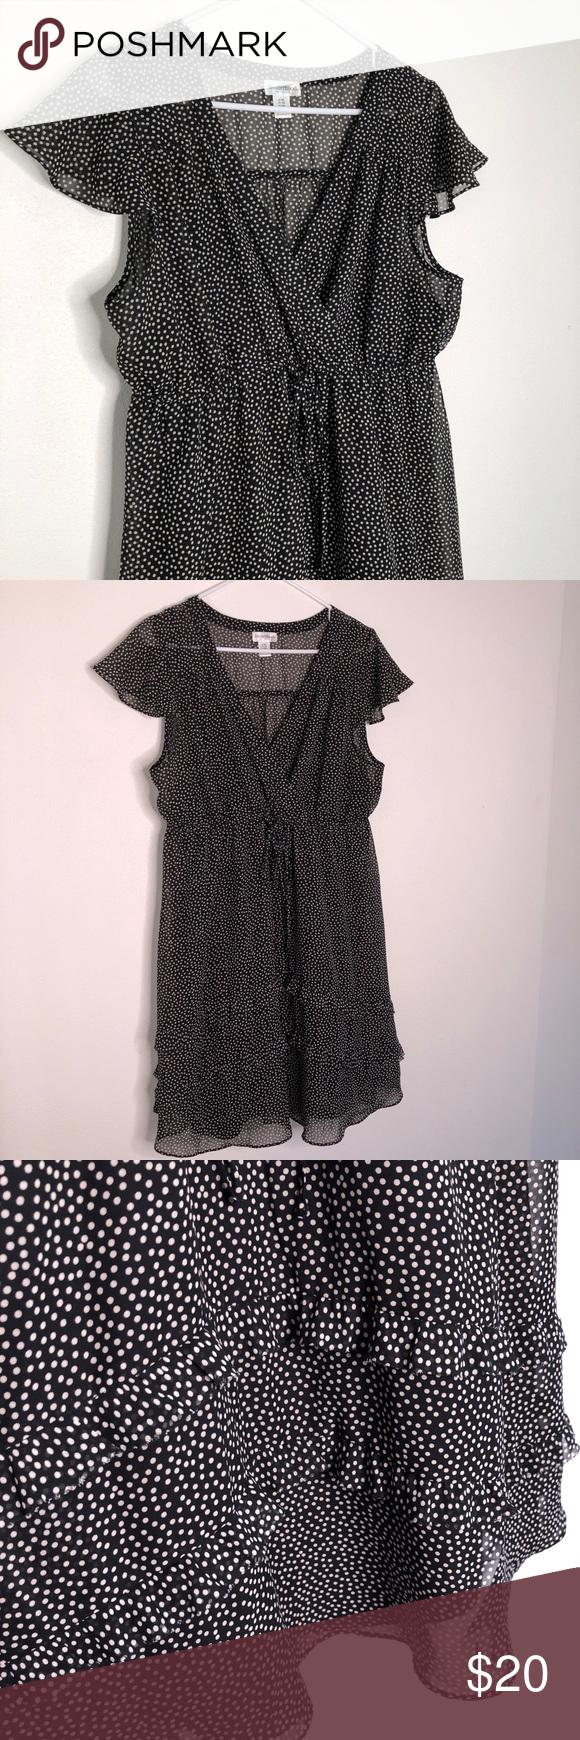 Motherhood Maternity Dress Xl Polka Dots Black And White Wrap Dress Full Slip Underneath Flutter Sleeves And Ruffled Hems Xl In 2019 Maternity Dresses White Wrap Dress Fashion